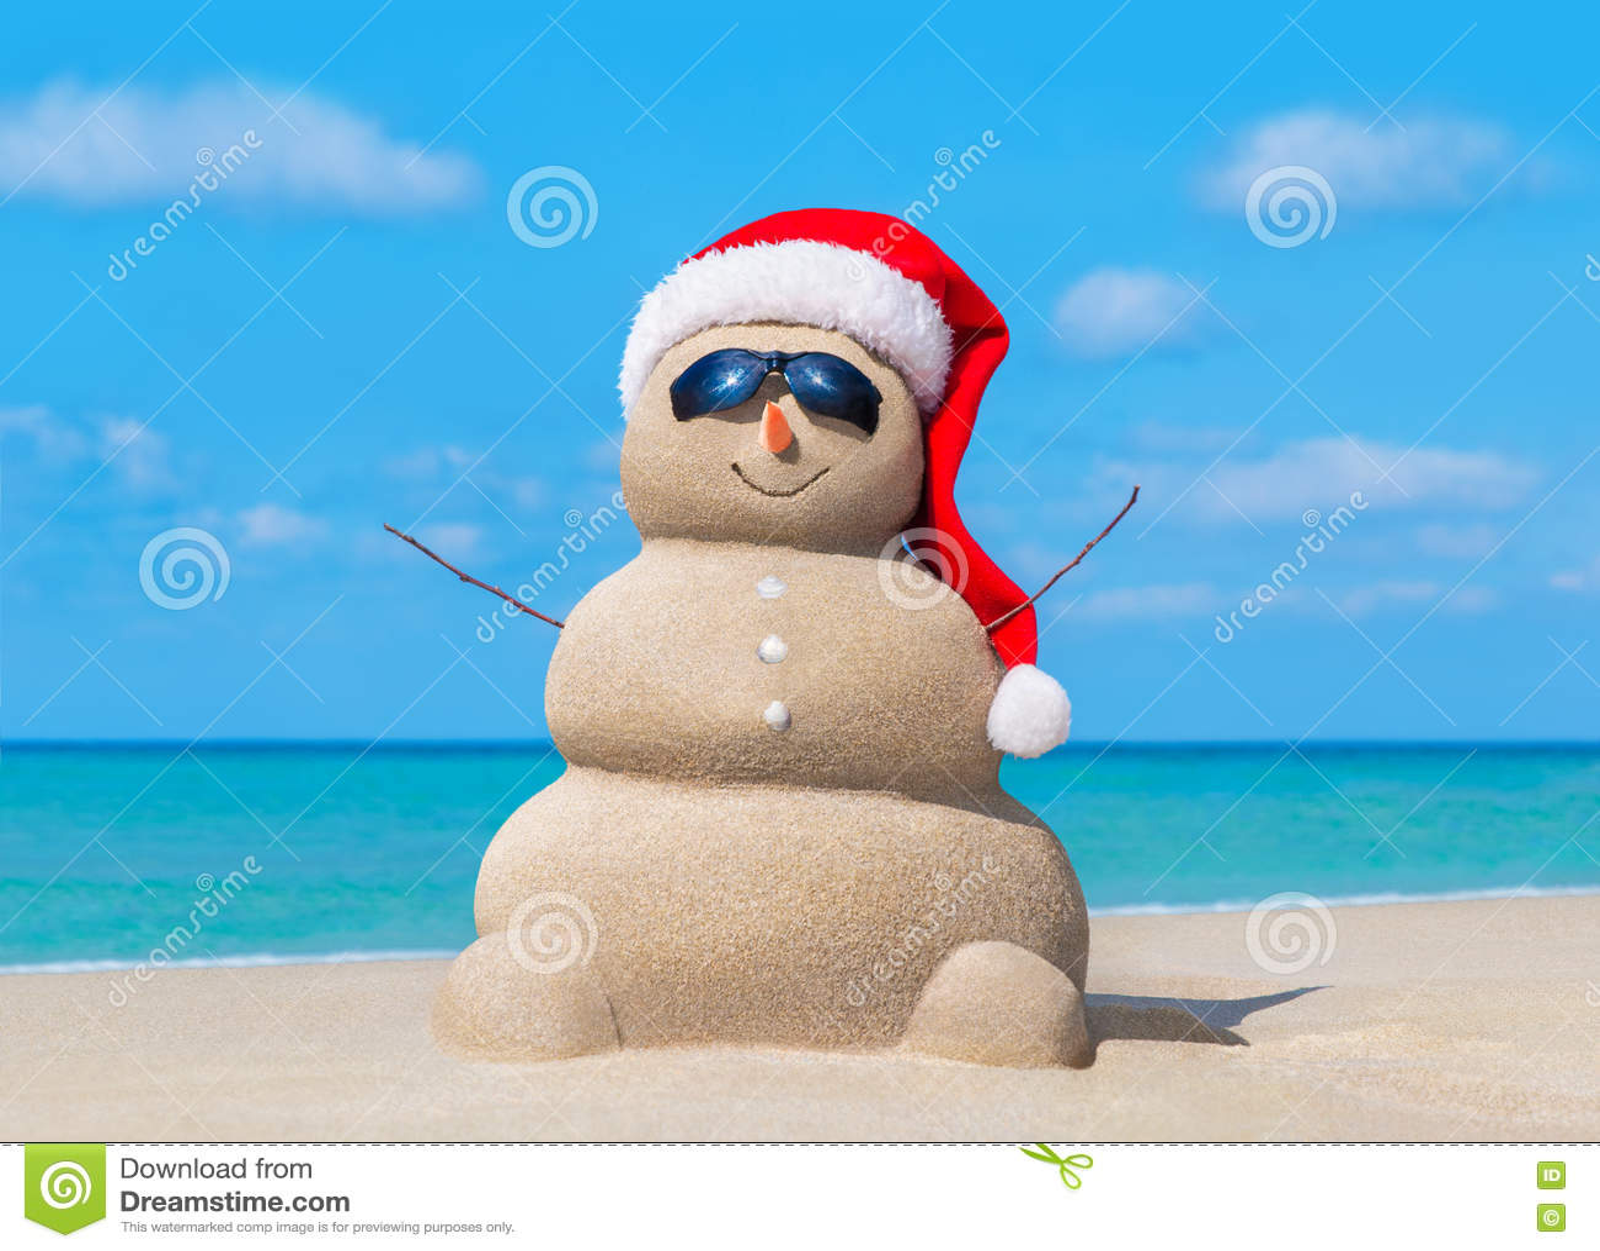 Snowman in Christmas Santa hat and sunglasses at ocean beach